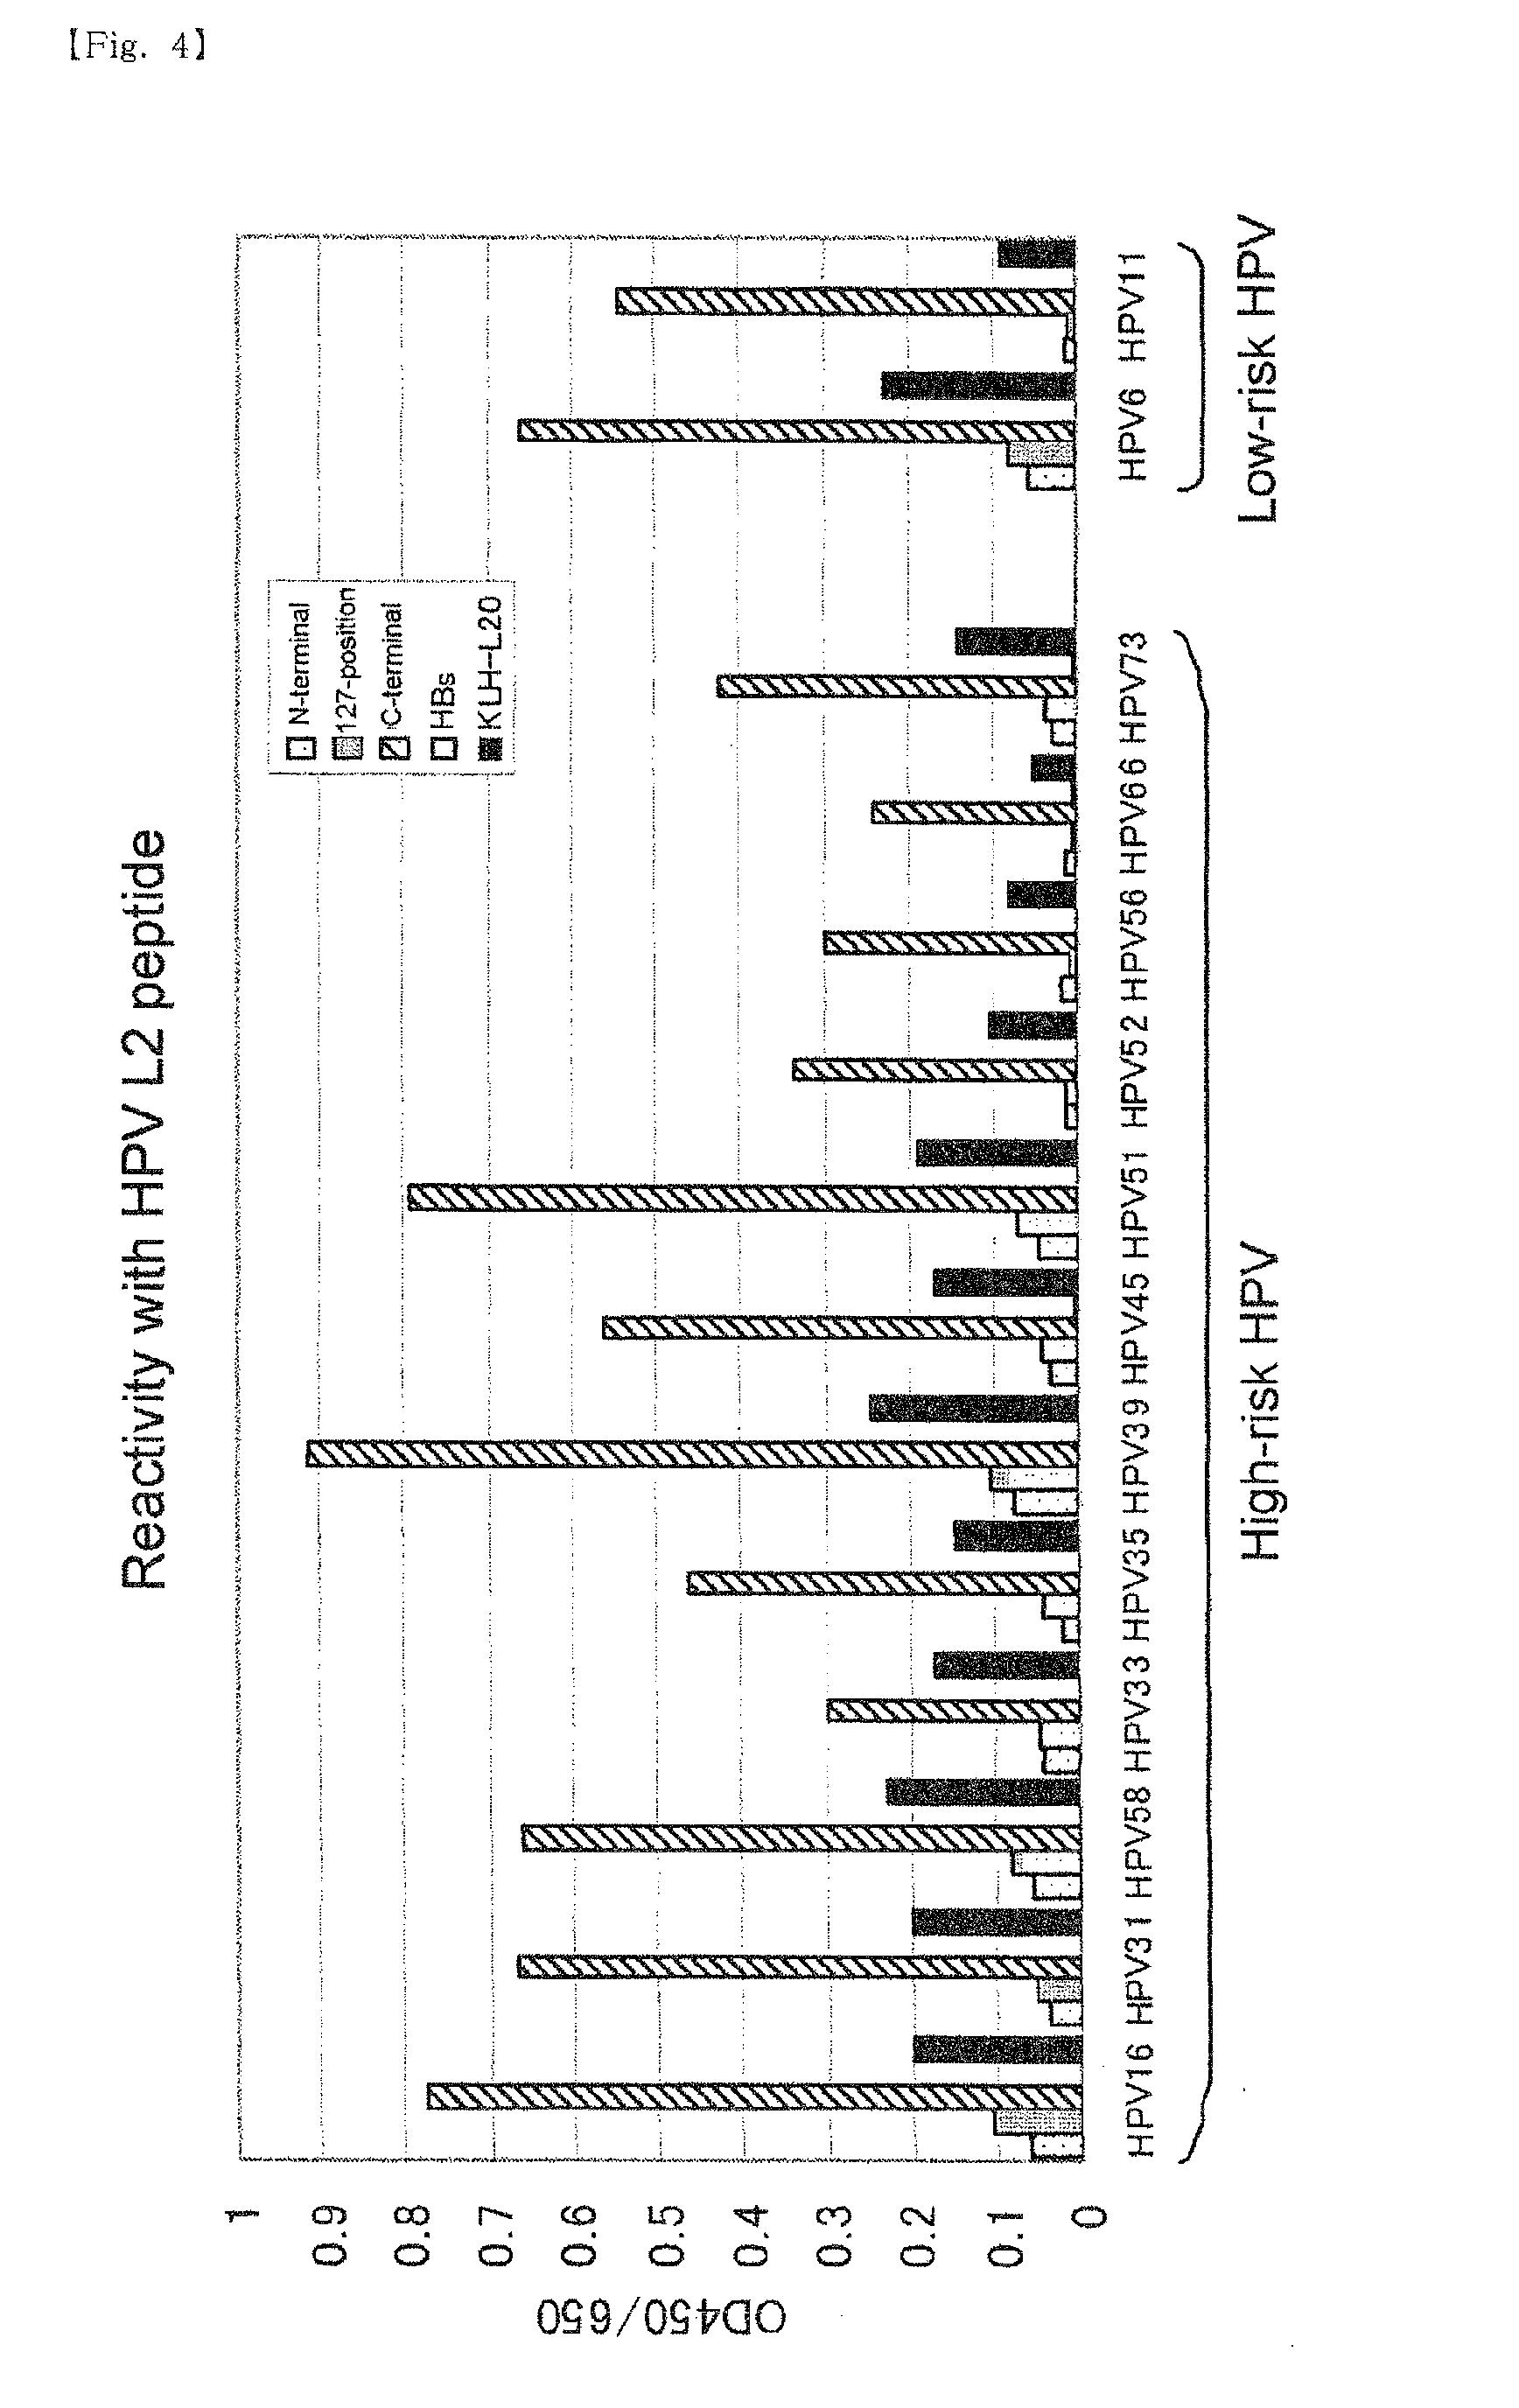 anti papilloma 4v verrugas hpv caracteristicas